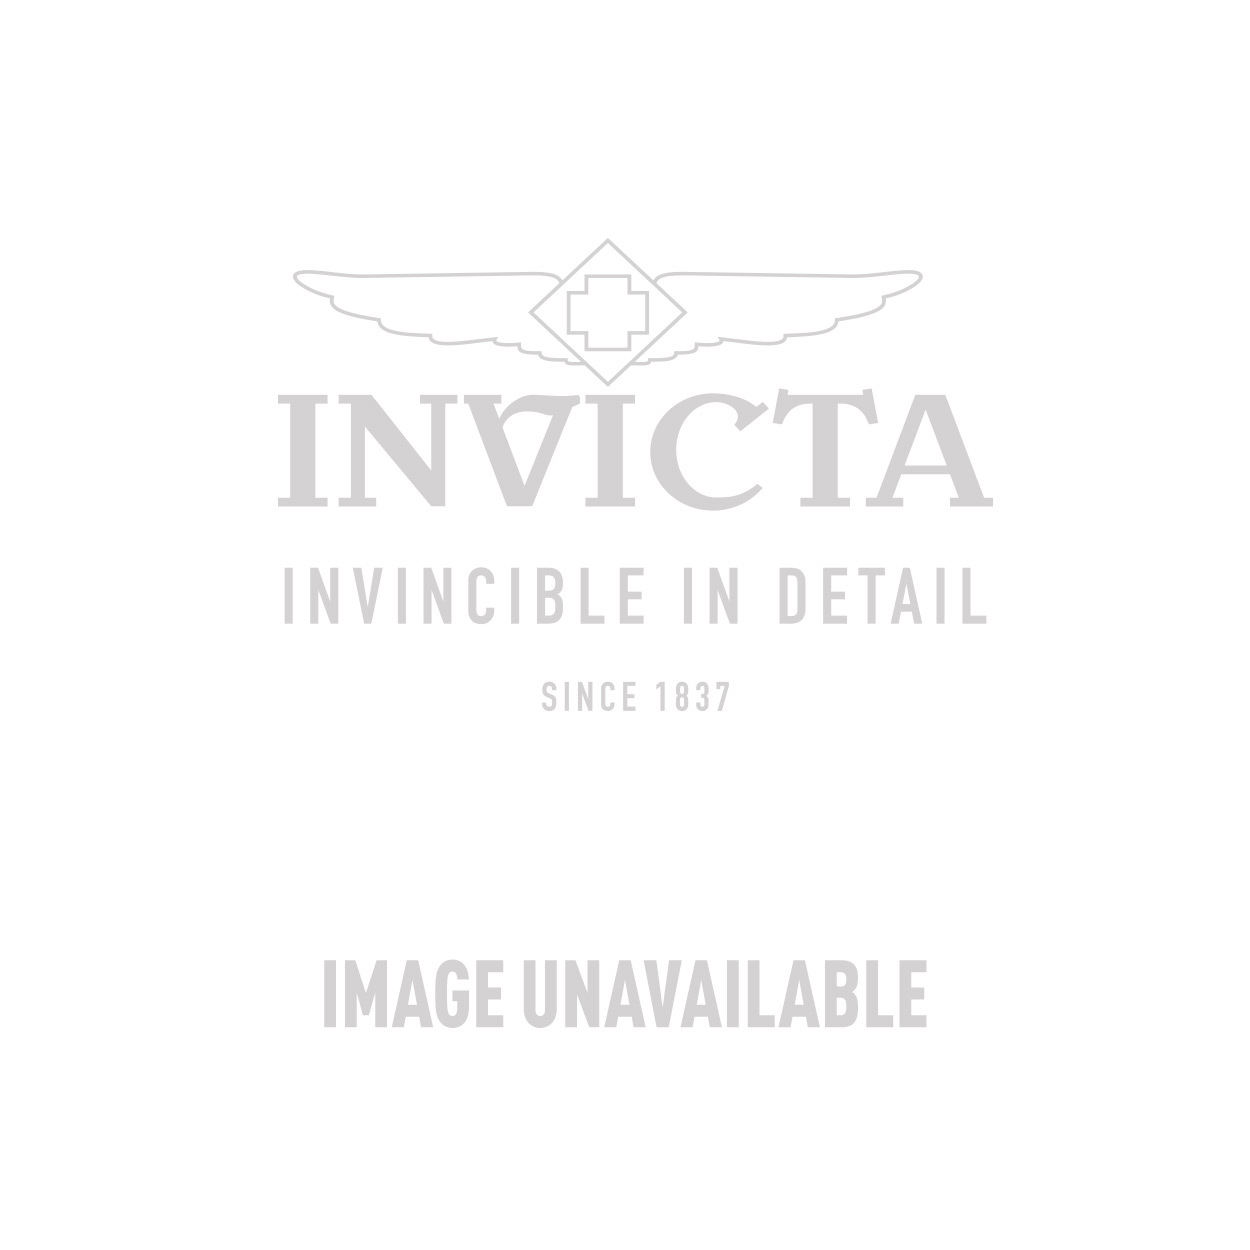 Invicta Angel Swiss Movement Quartz Watch - Rose Gold case with Pink tone Genuine Stingray band - Model 17876